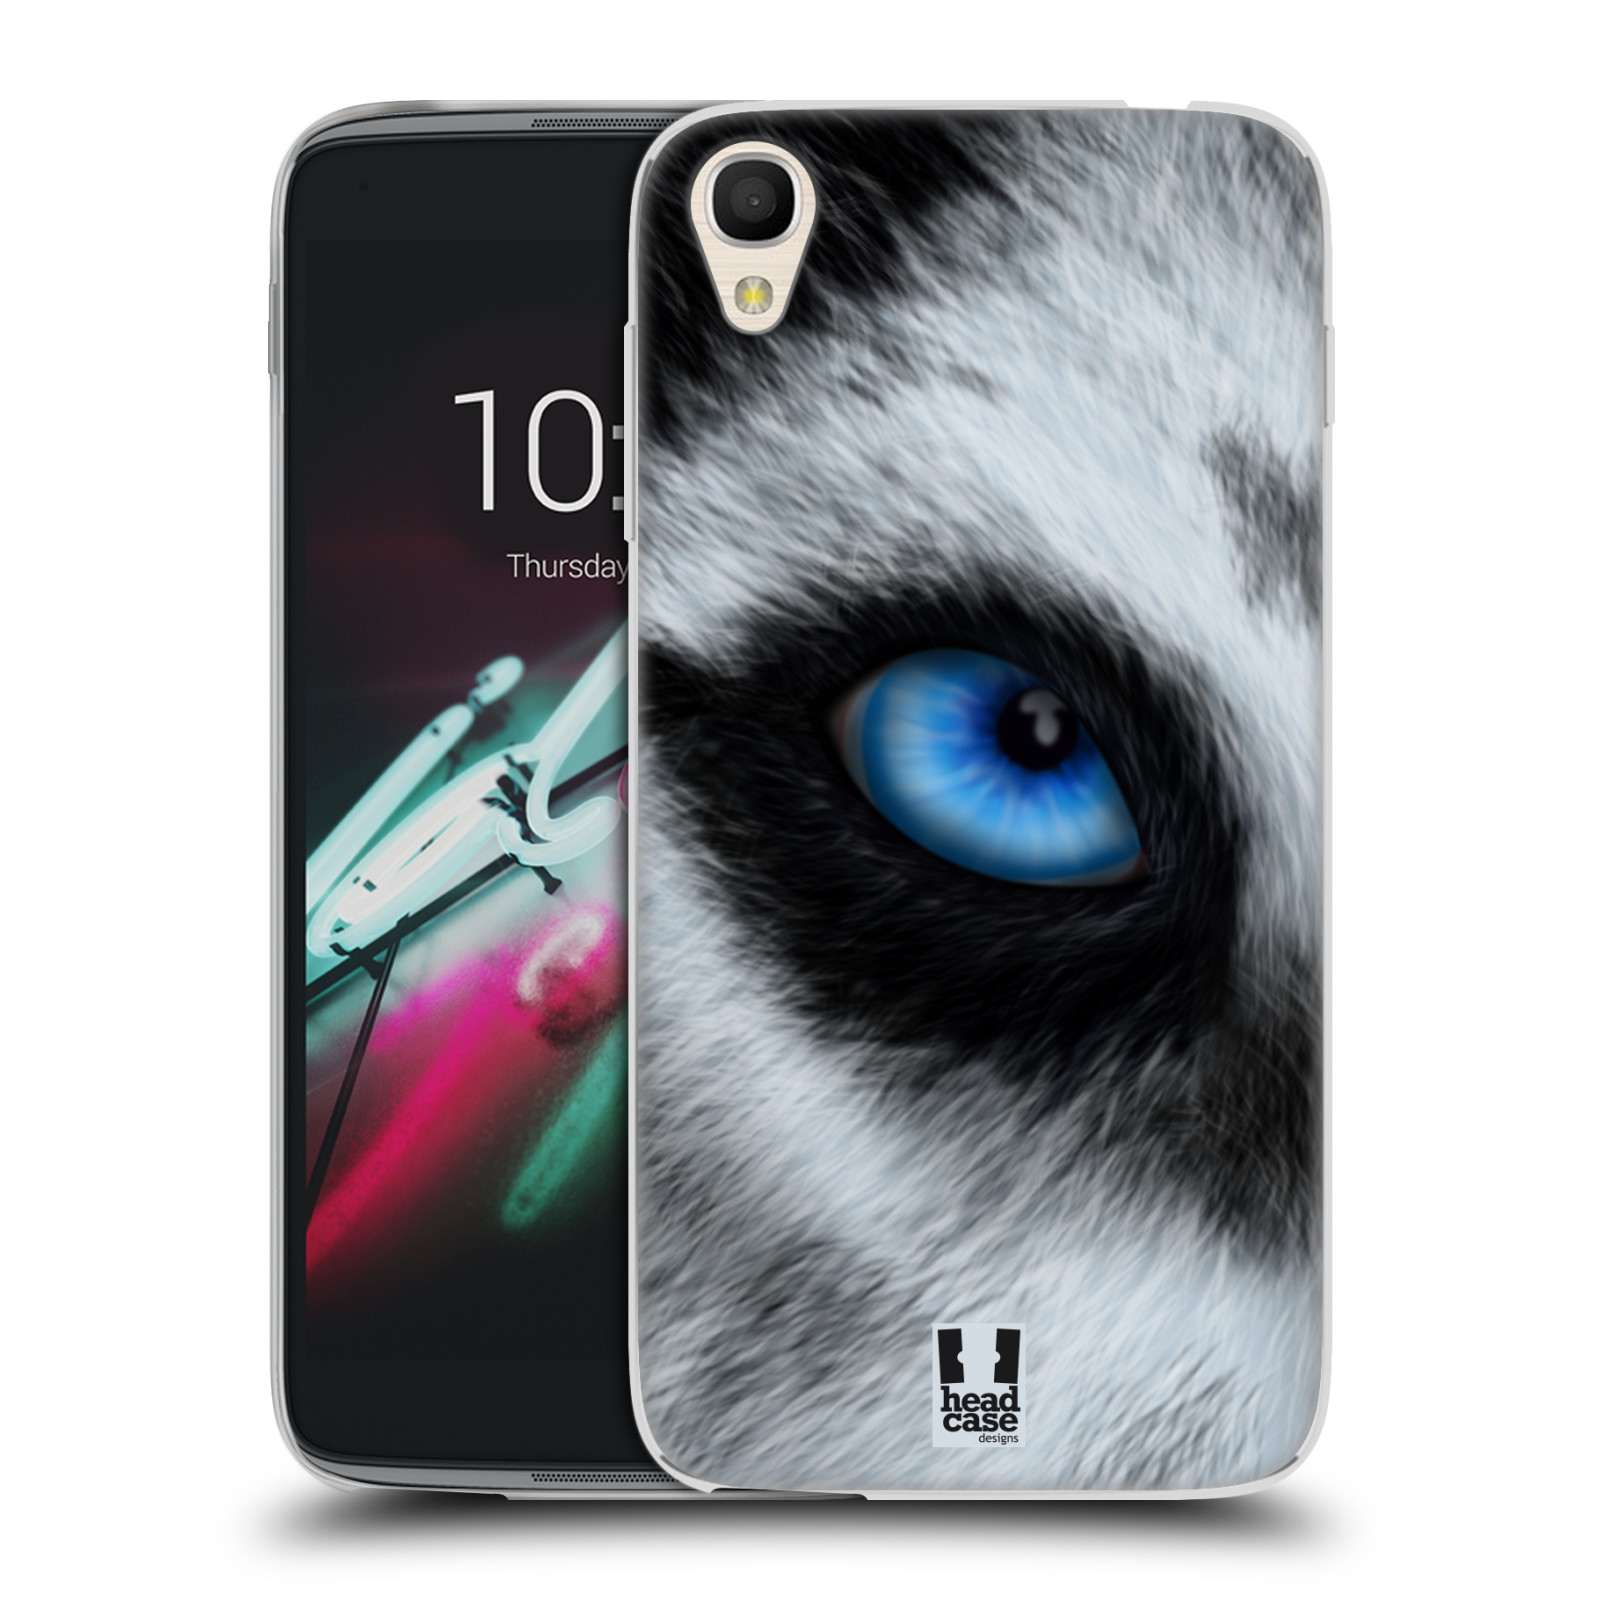 HEAD CASE silikonový obal na mobil Alcatel Idol 3 OT-6039Y (4.7) vzor pohled zvířete oko pes husky